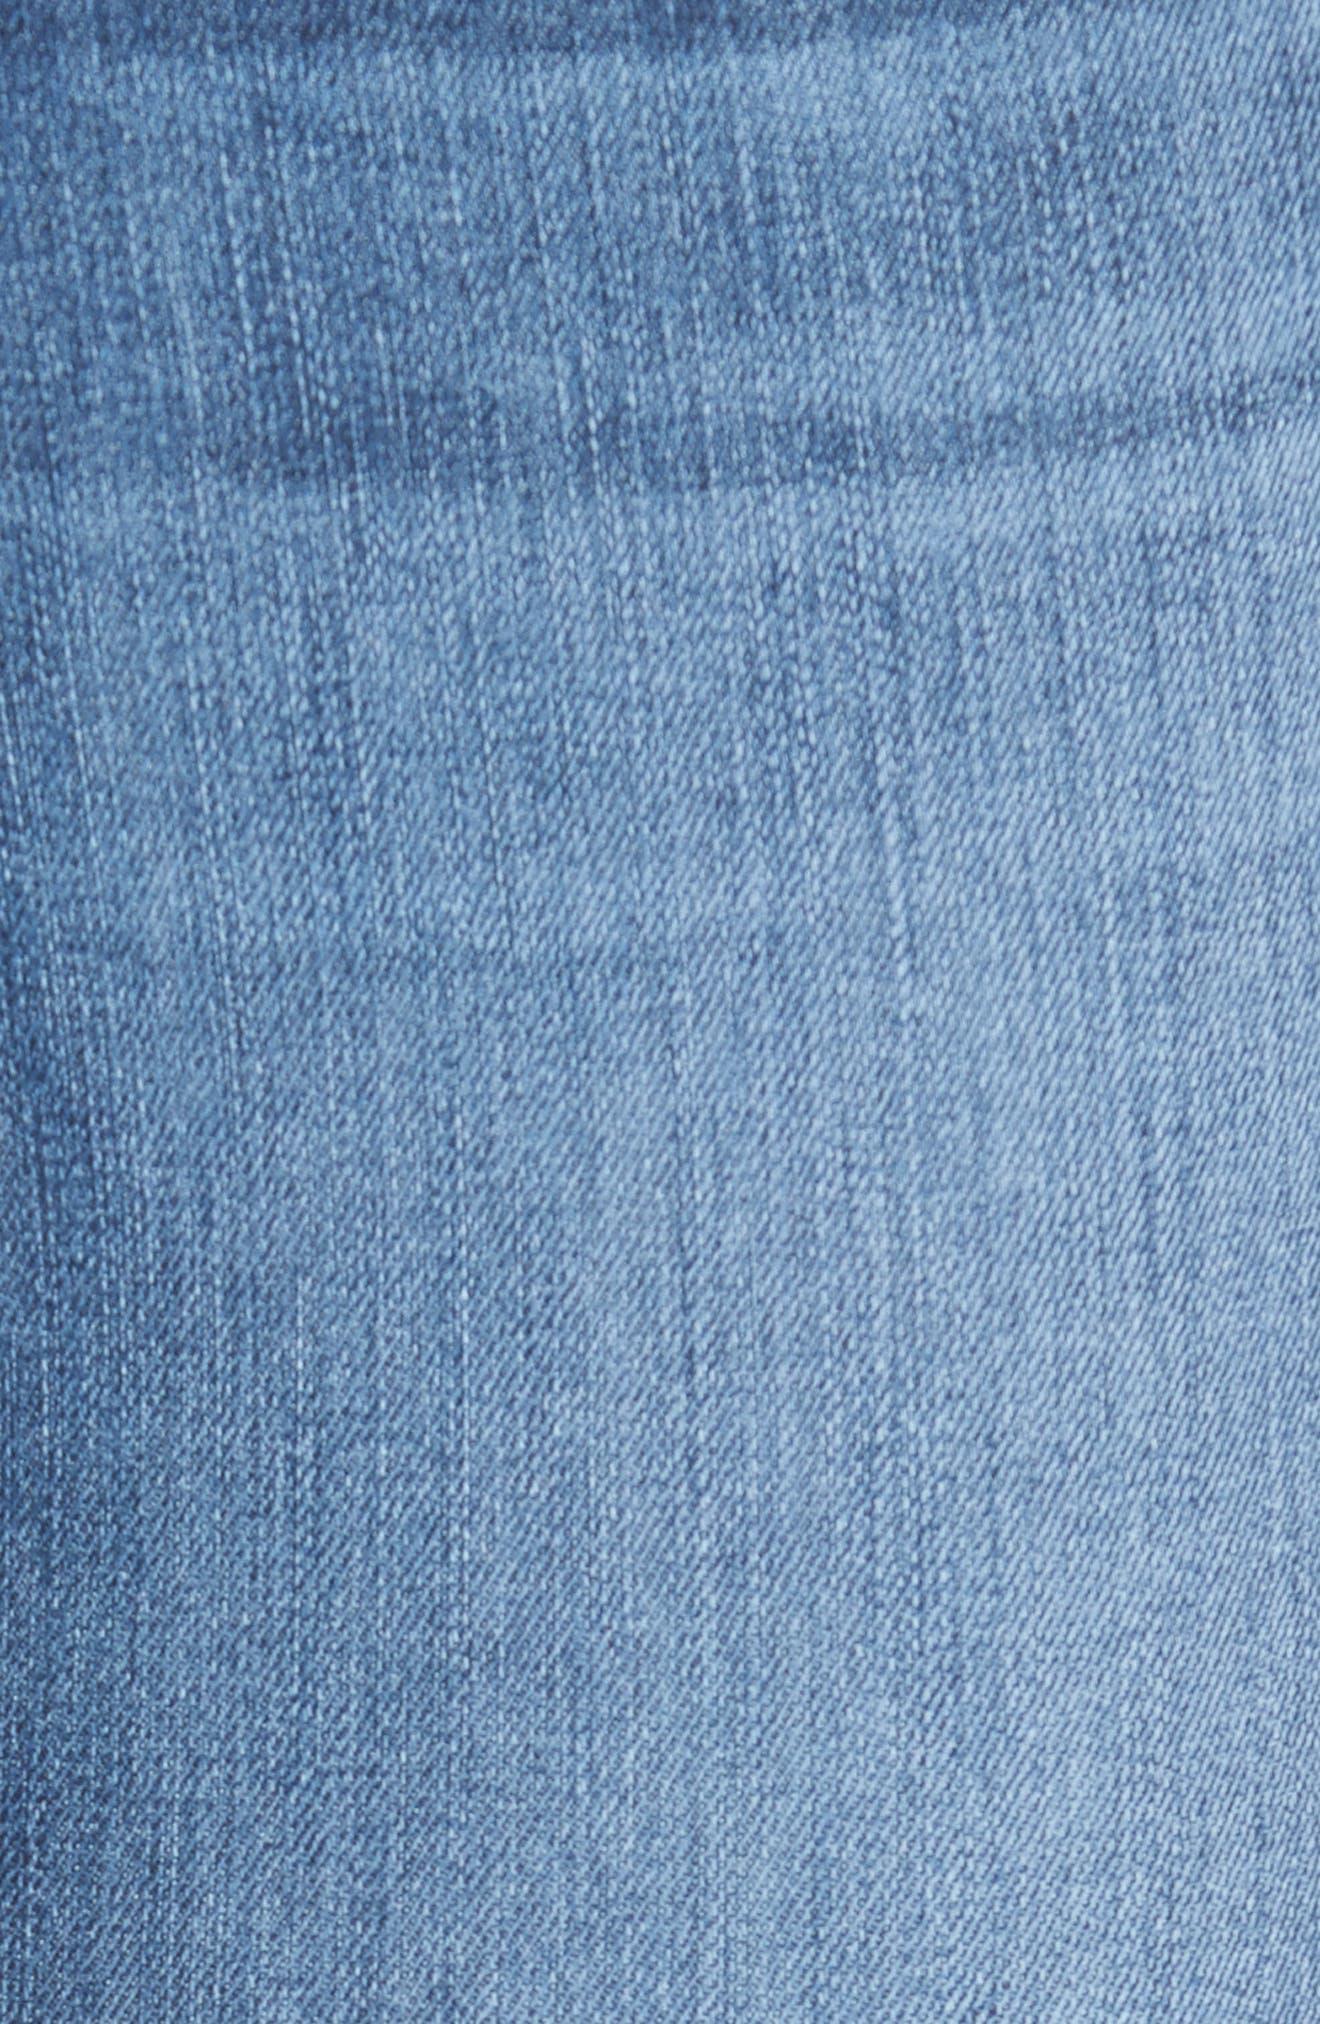 High Waist Ankle Skinny Jeans,                             Alternate thumbnail 6, color,                             426